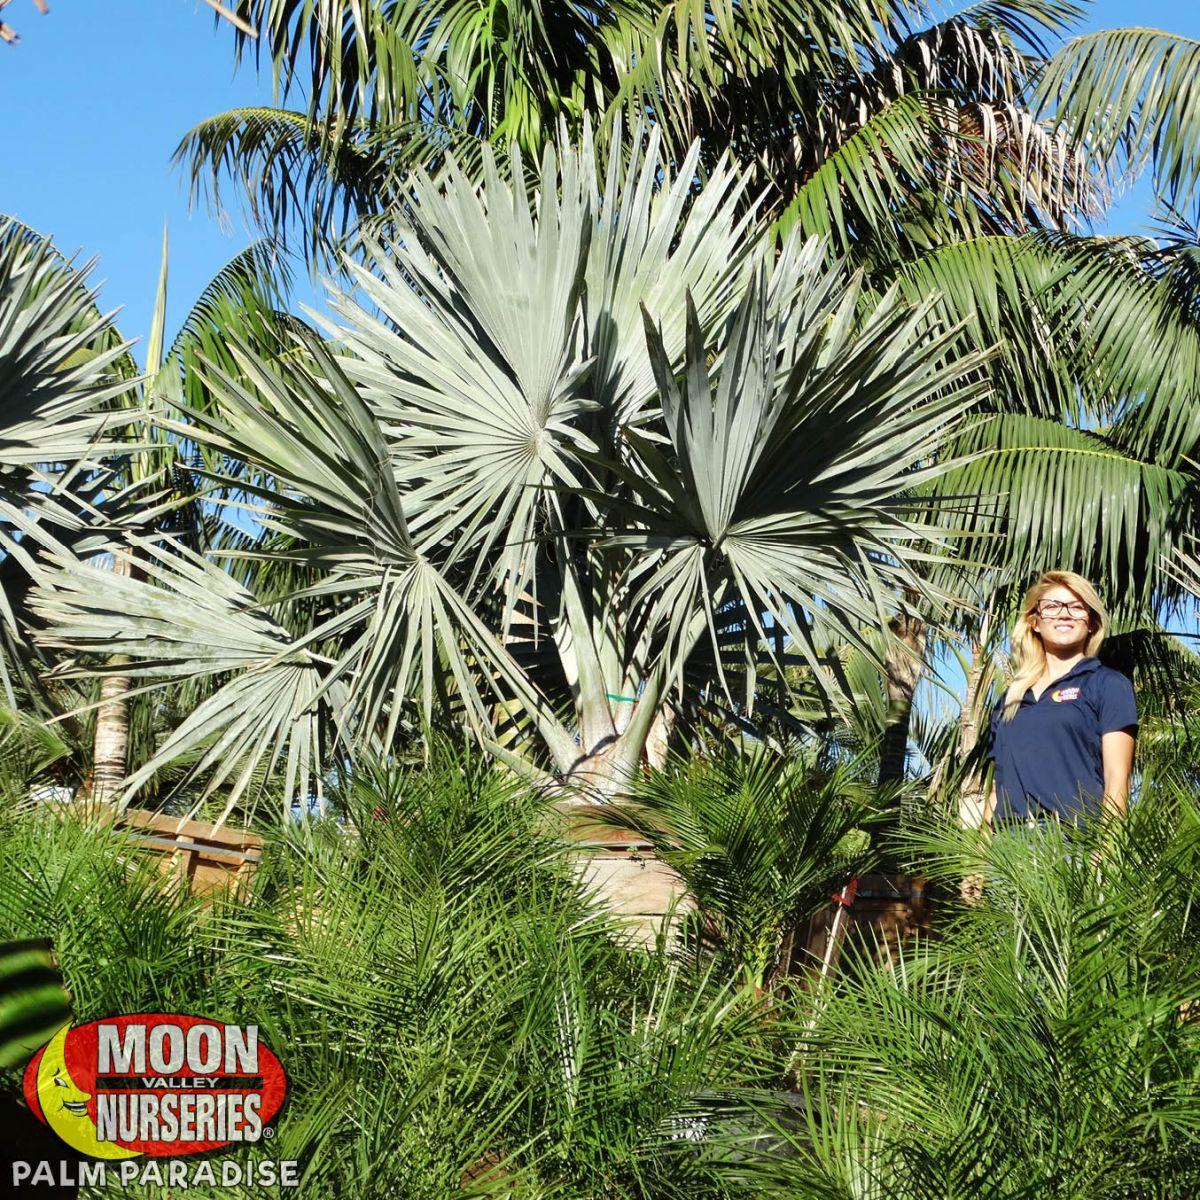 Bismarck Palm Palm Tree Palm Paradise Nursery